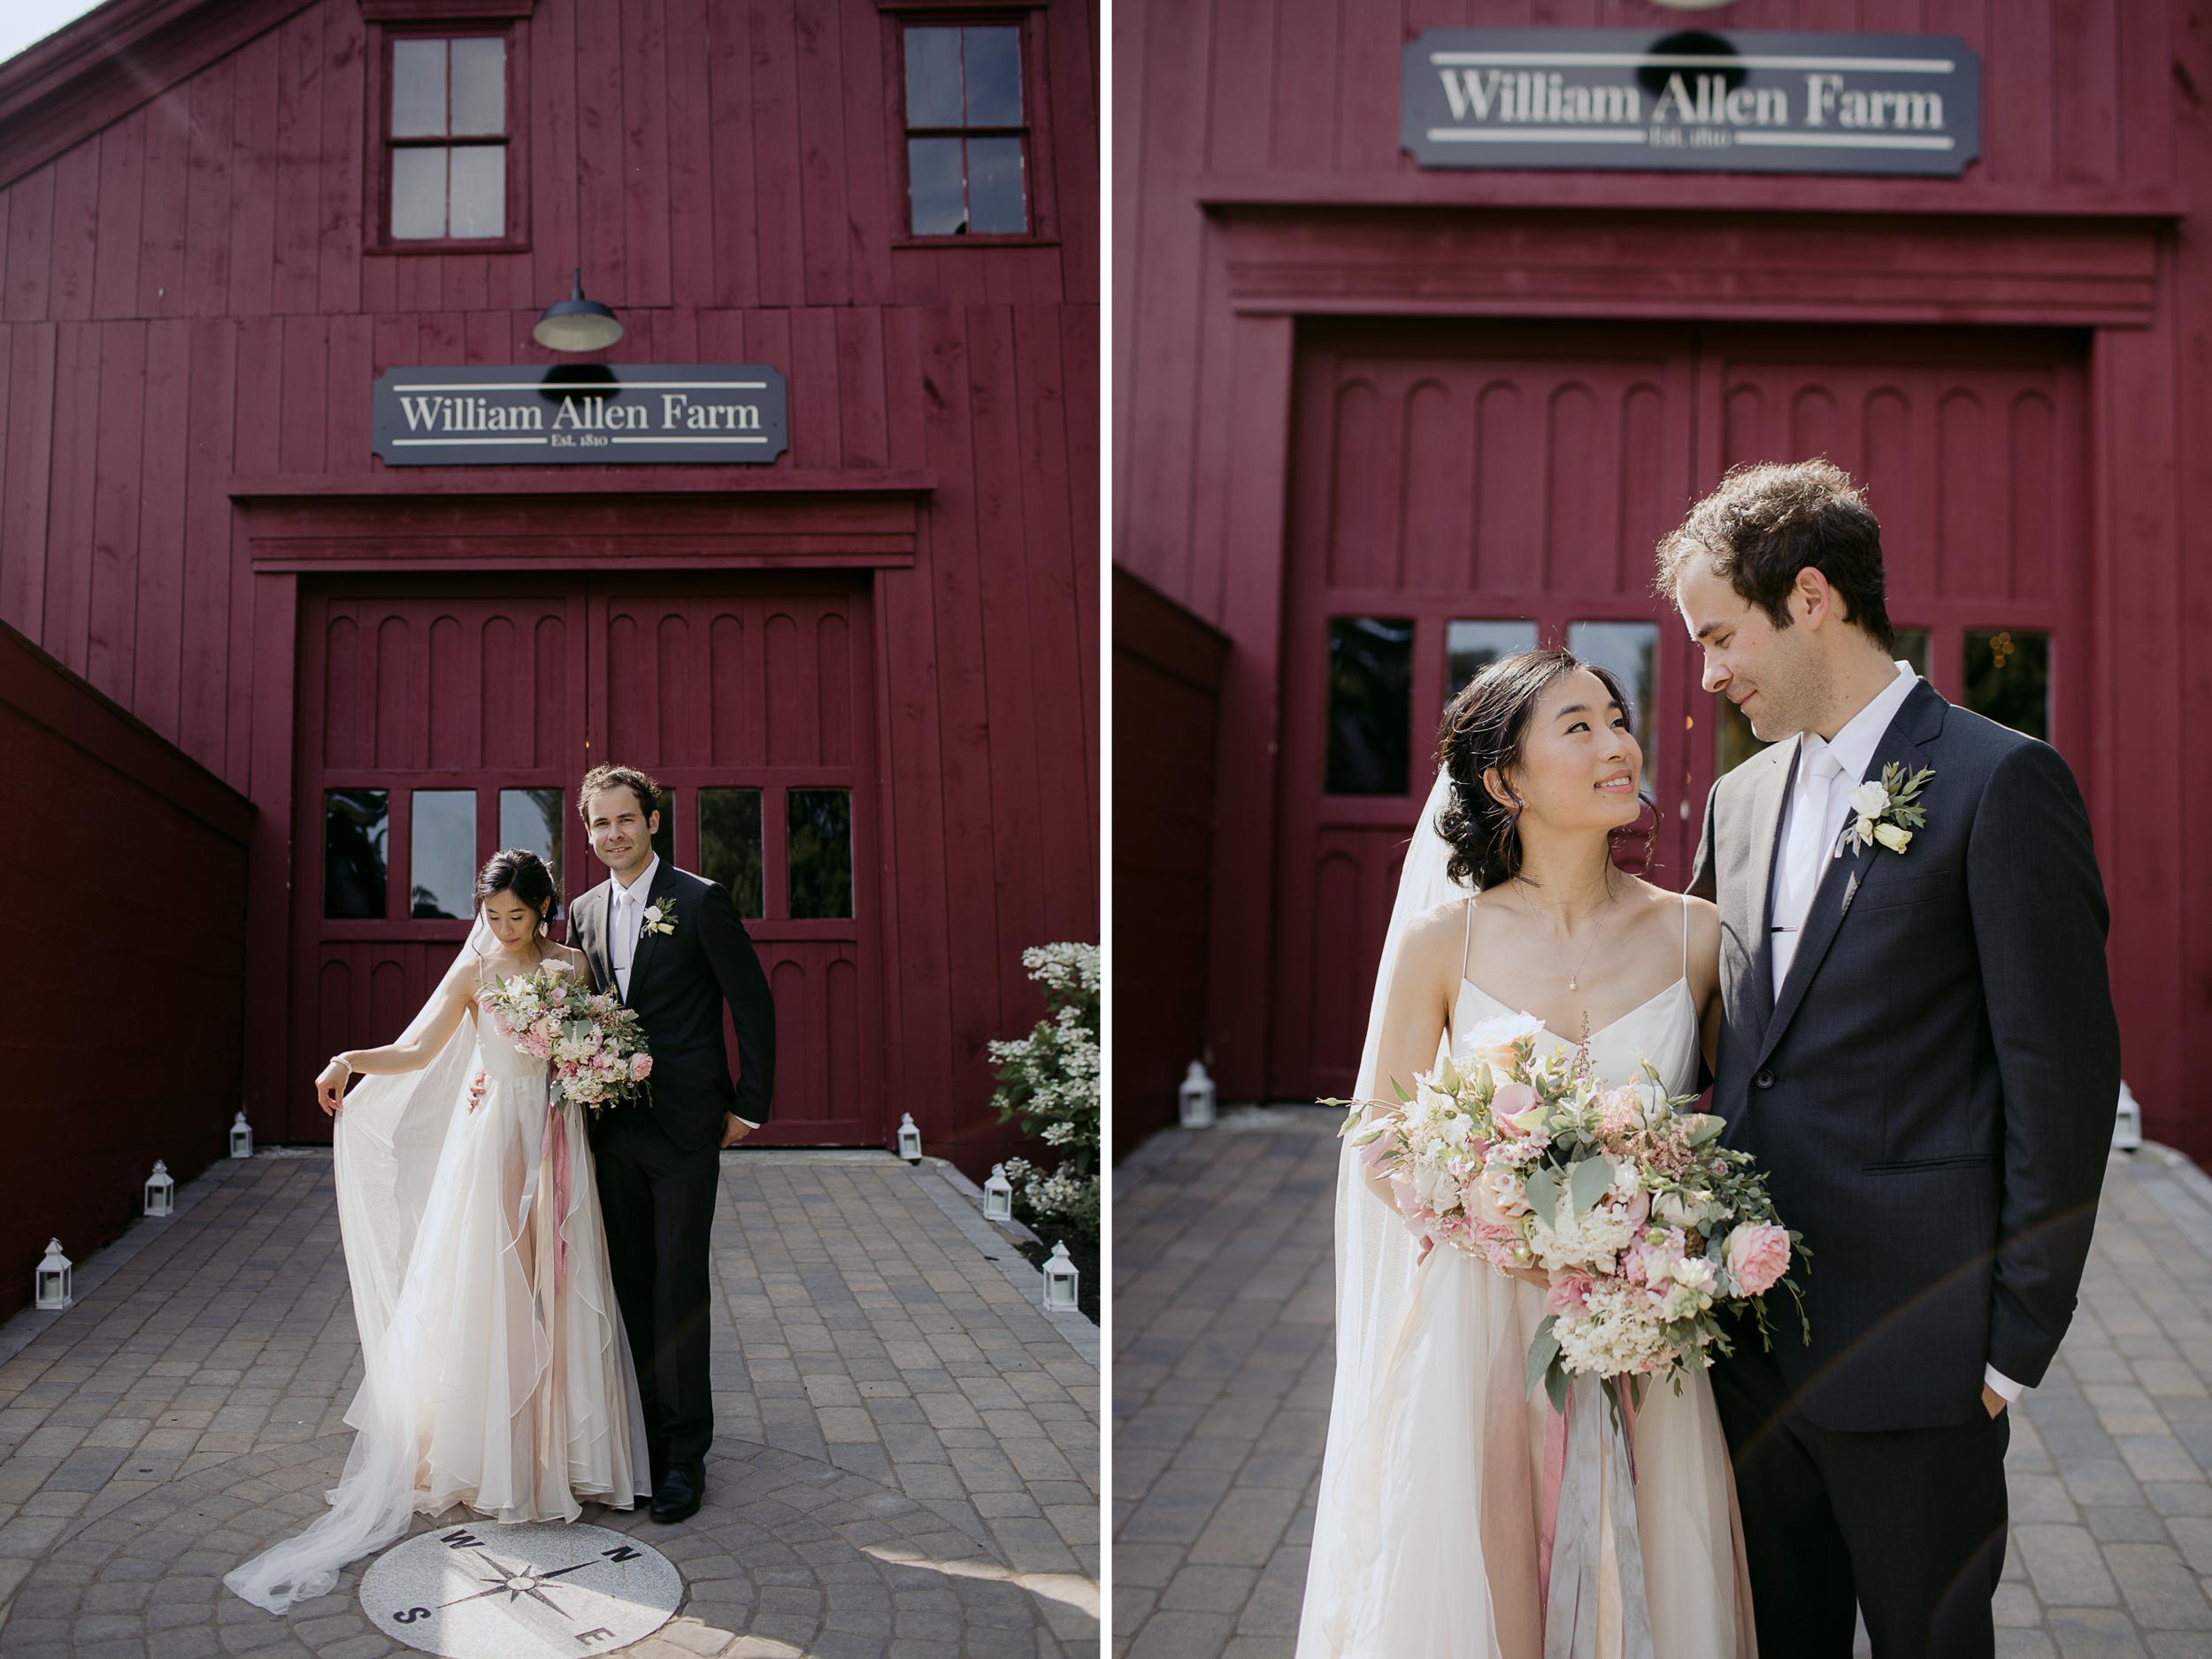 william_allen_farm_wedding_pownal_maine_ilkatayler-21.jpg